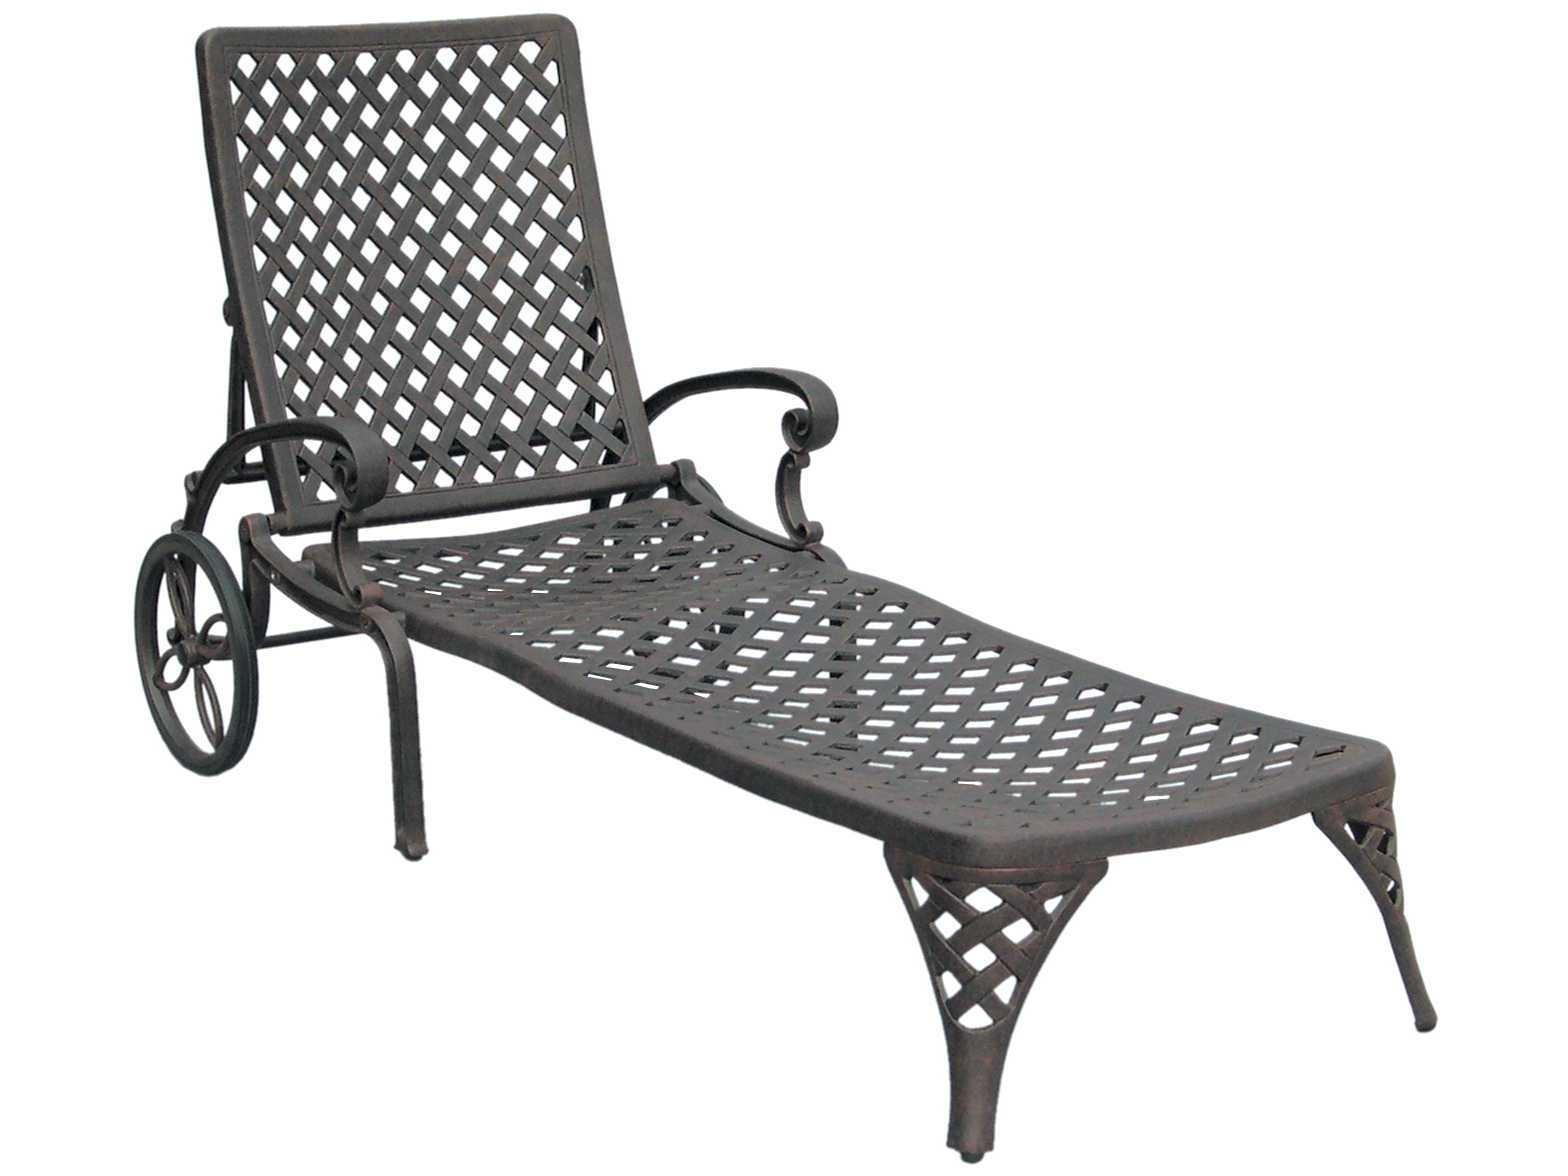 Darlee Outdoor Living Standard Nassau Cast Aluminum Antique Bronze In Most Popular Cast Aluminum Chaise Lounges (View 2 of 15)